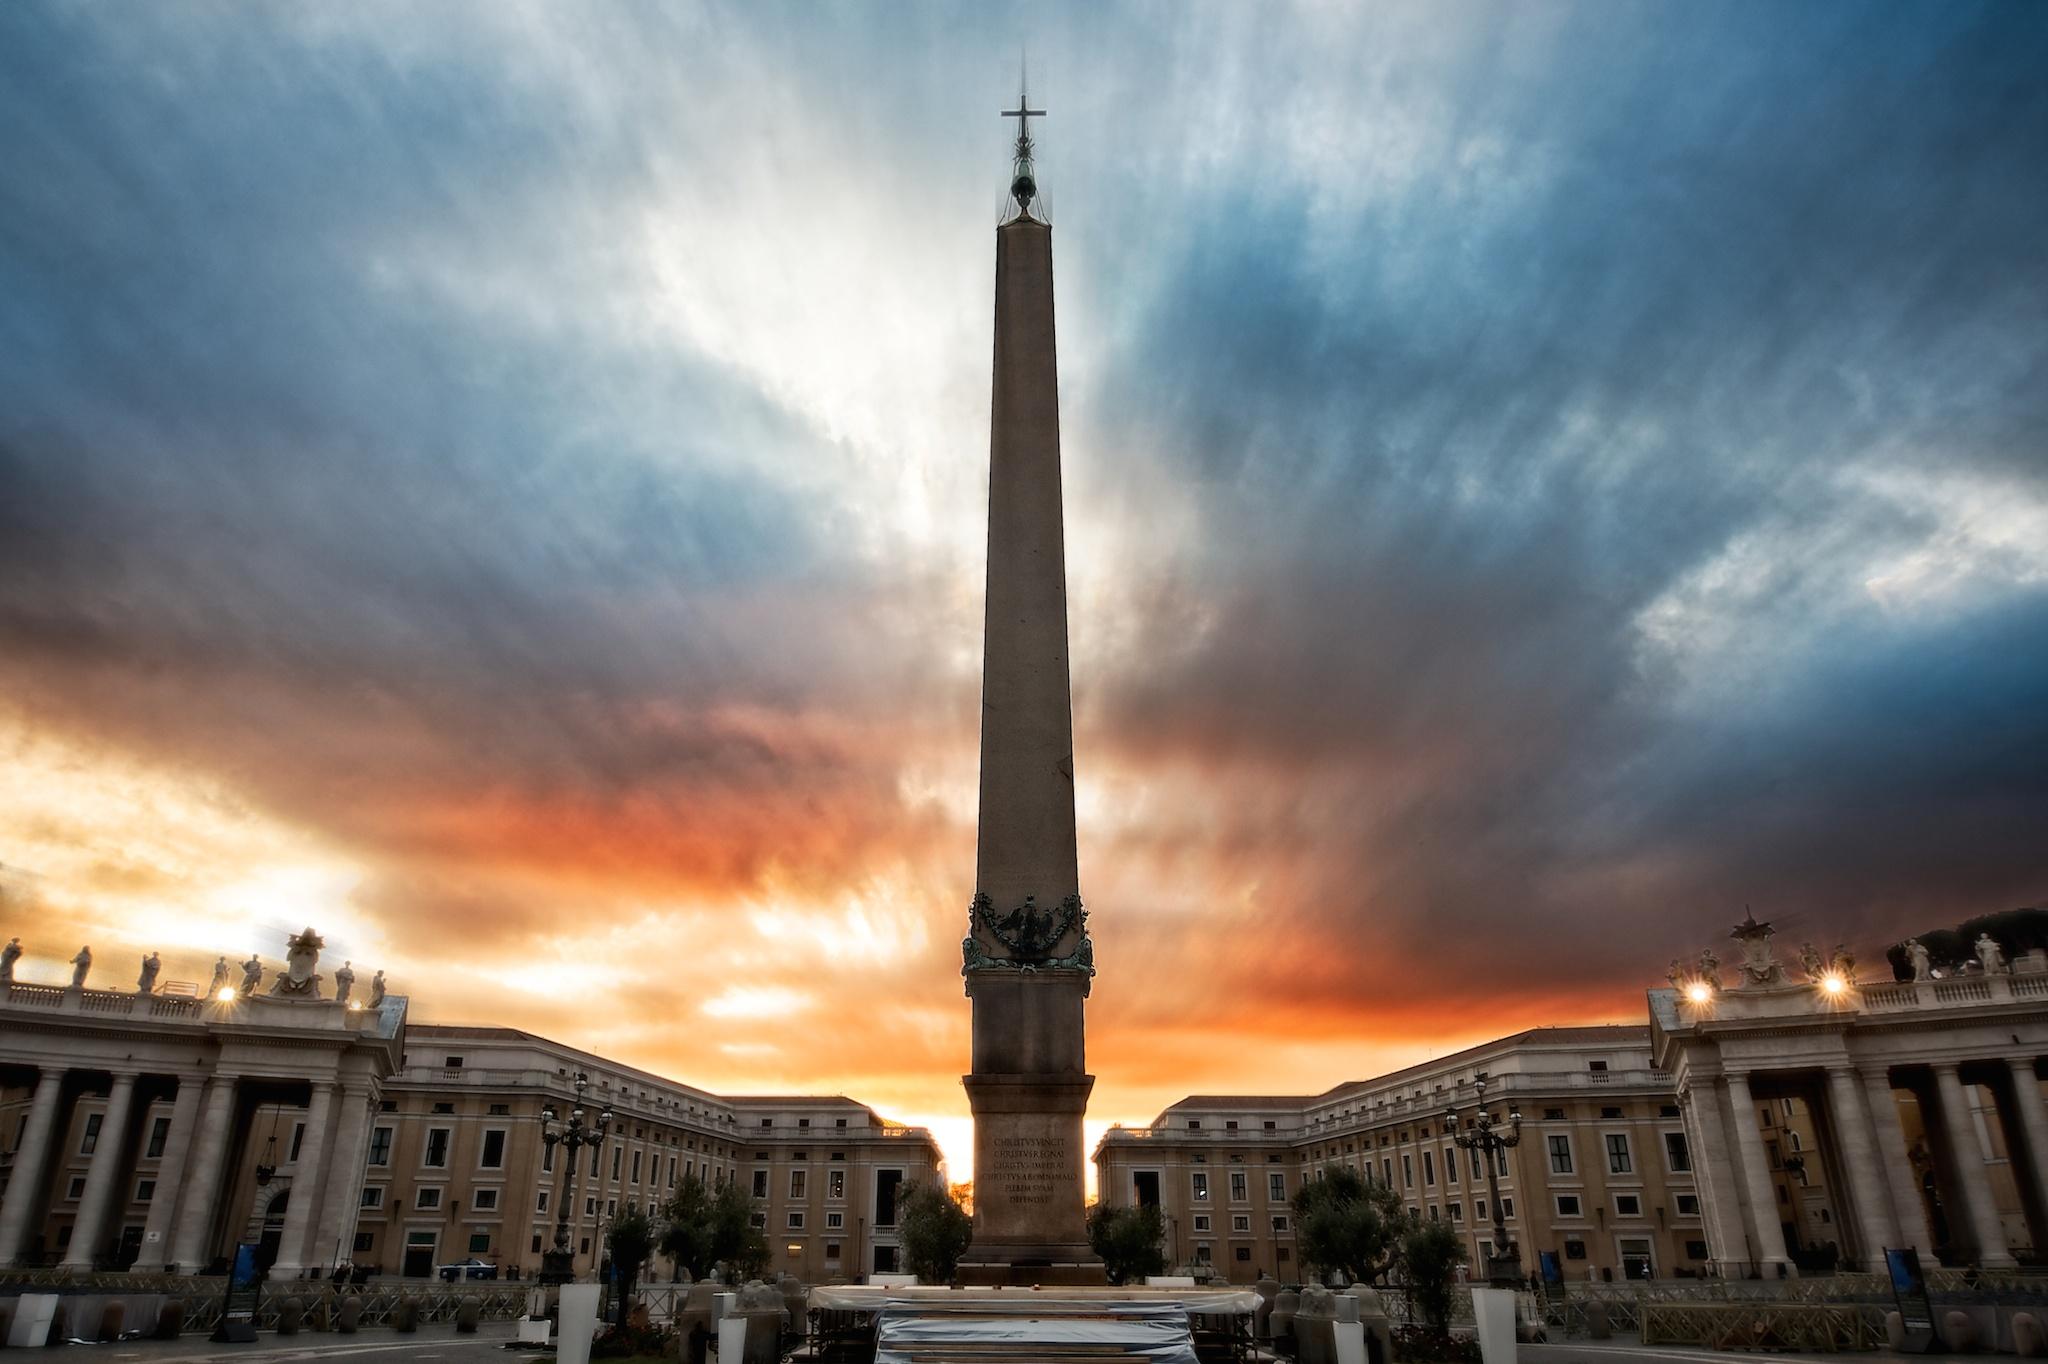 Sunburst At St. Peter's Square, Vatican City